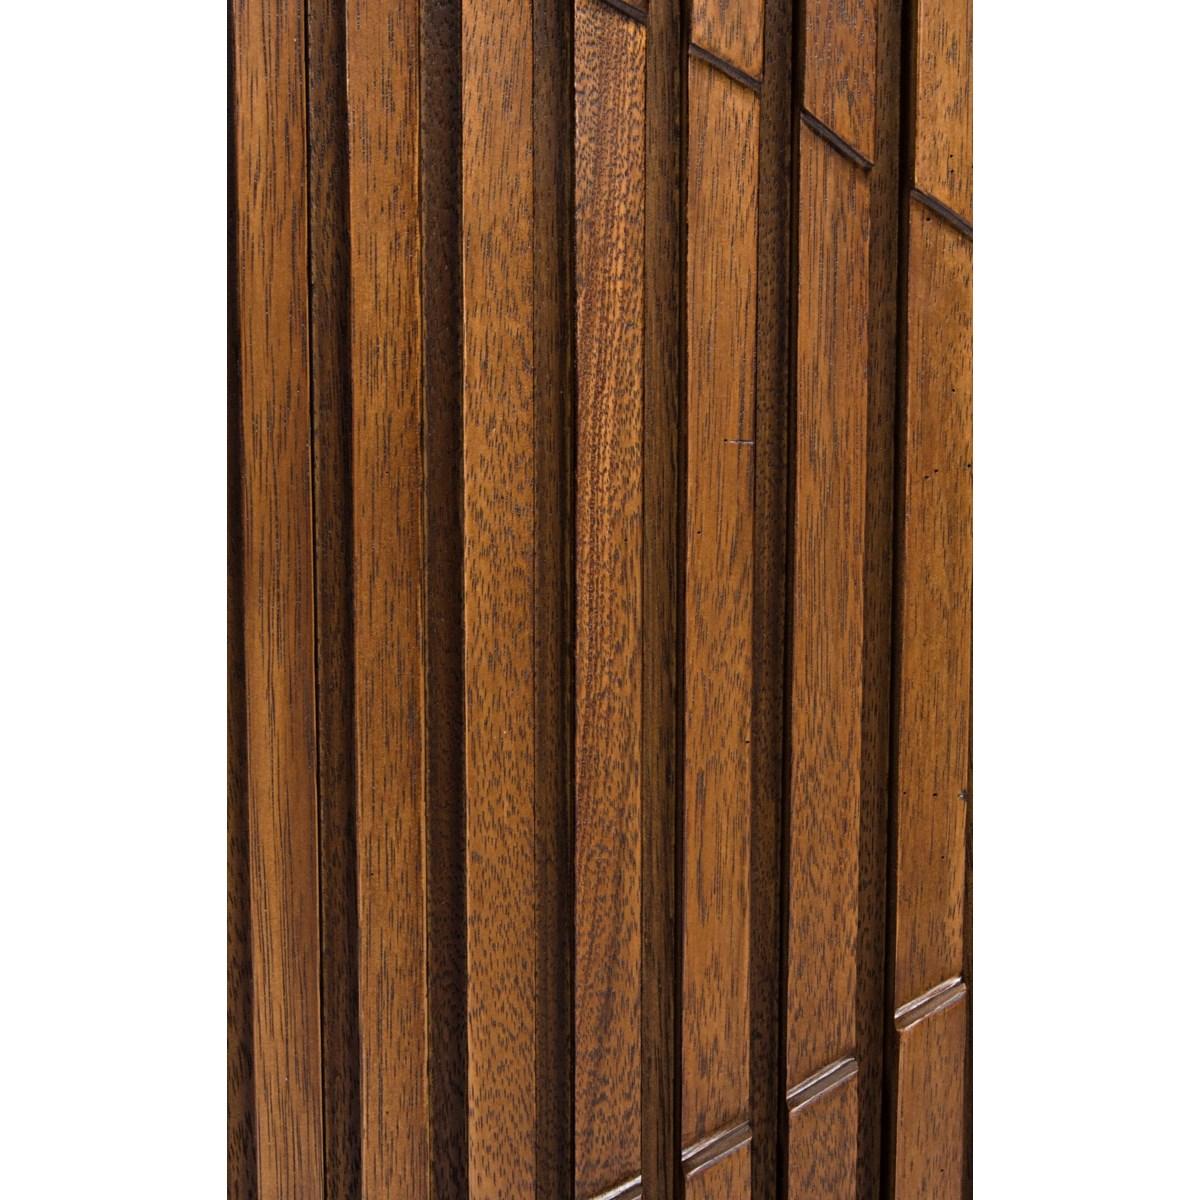 Illusion Single Sideboard with Steel Base, Dark Walnut